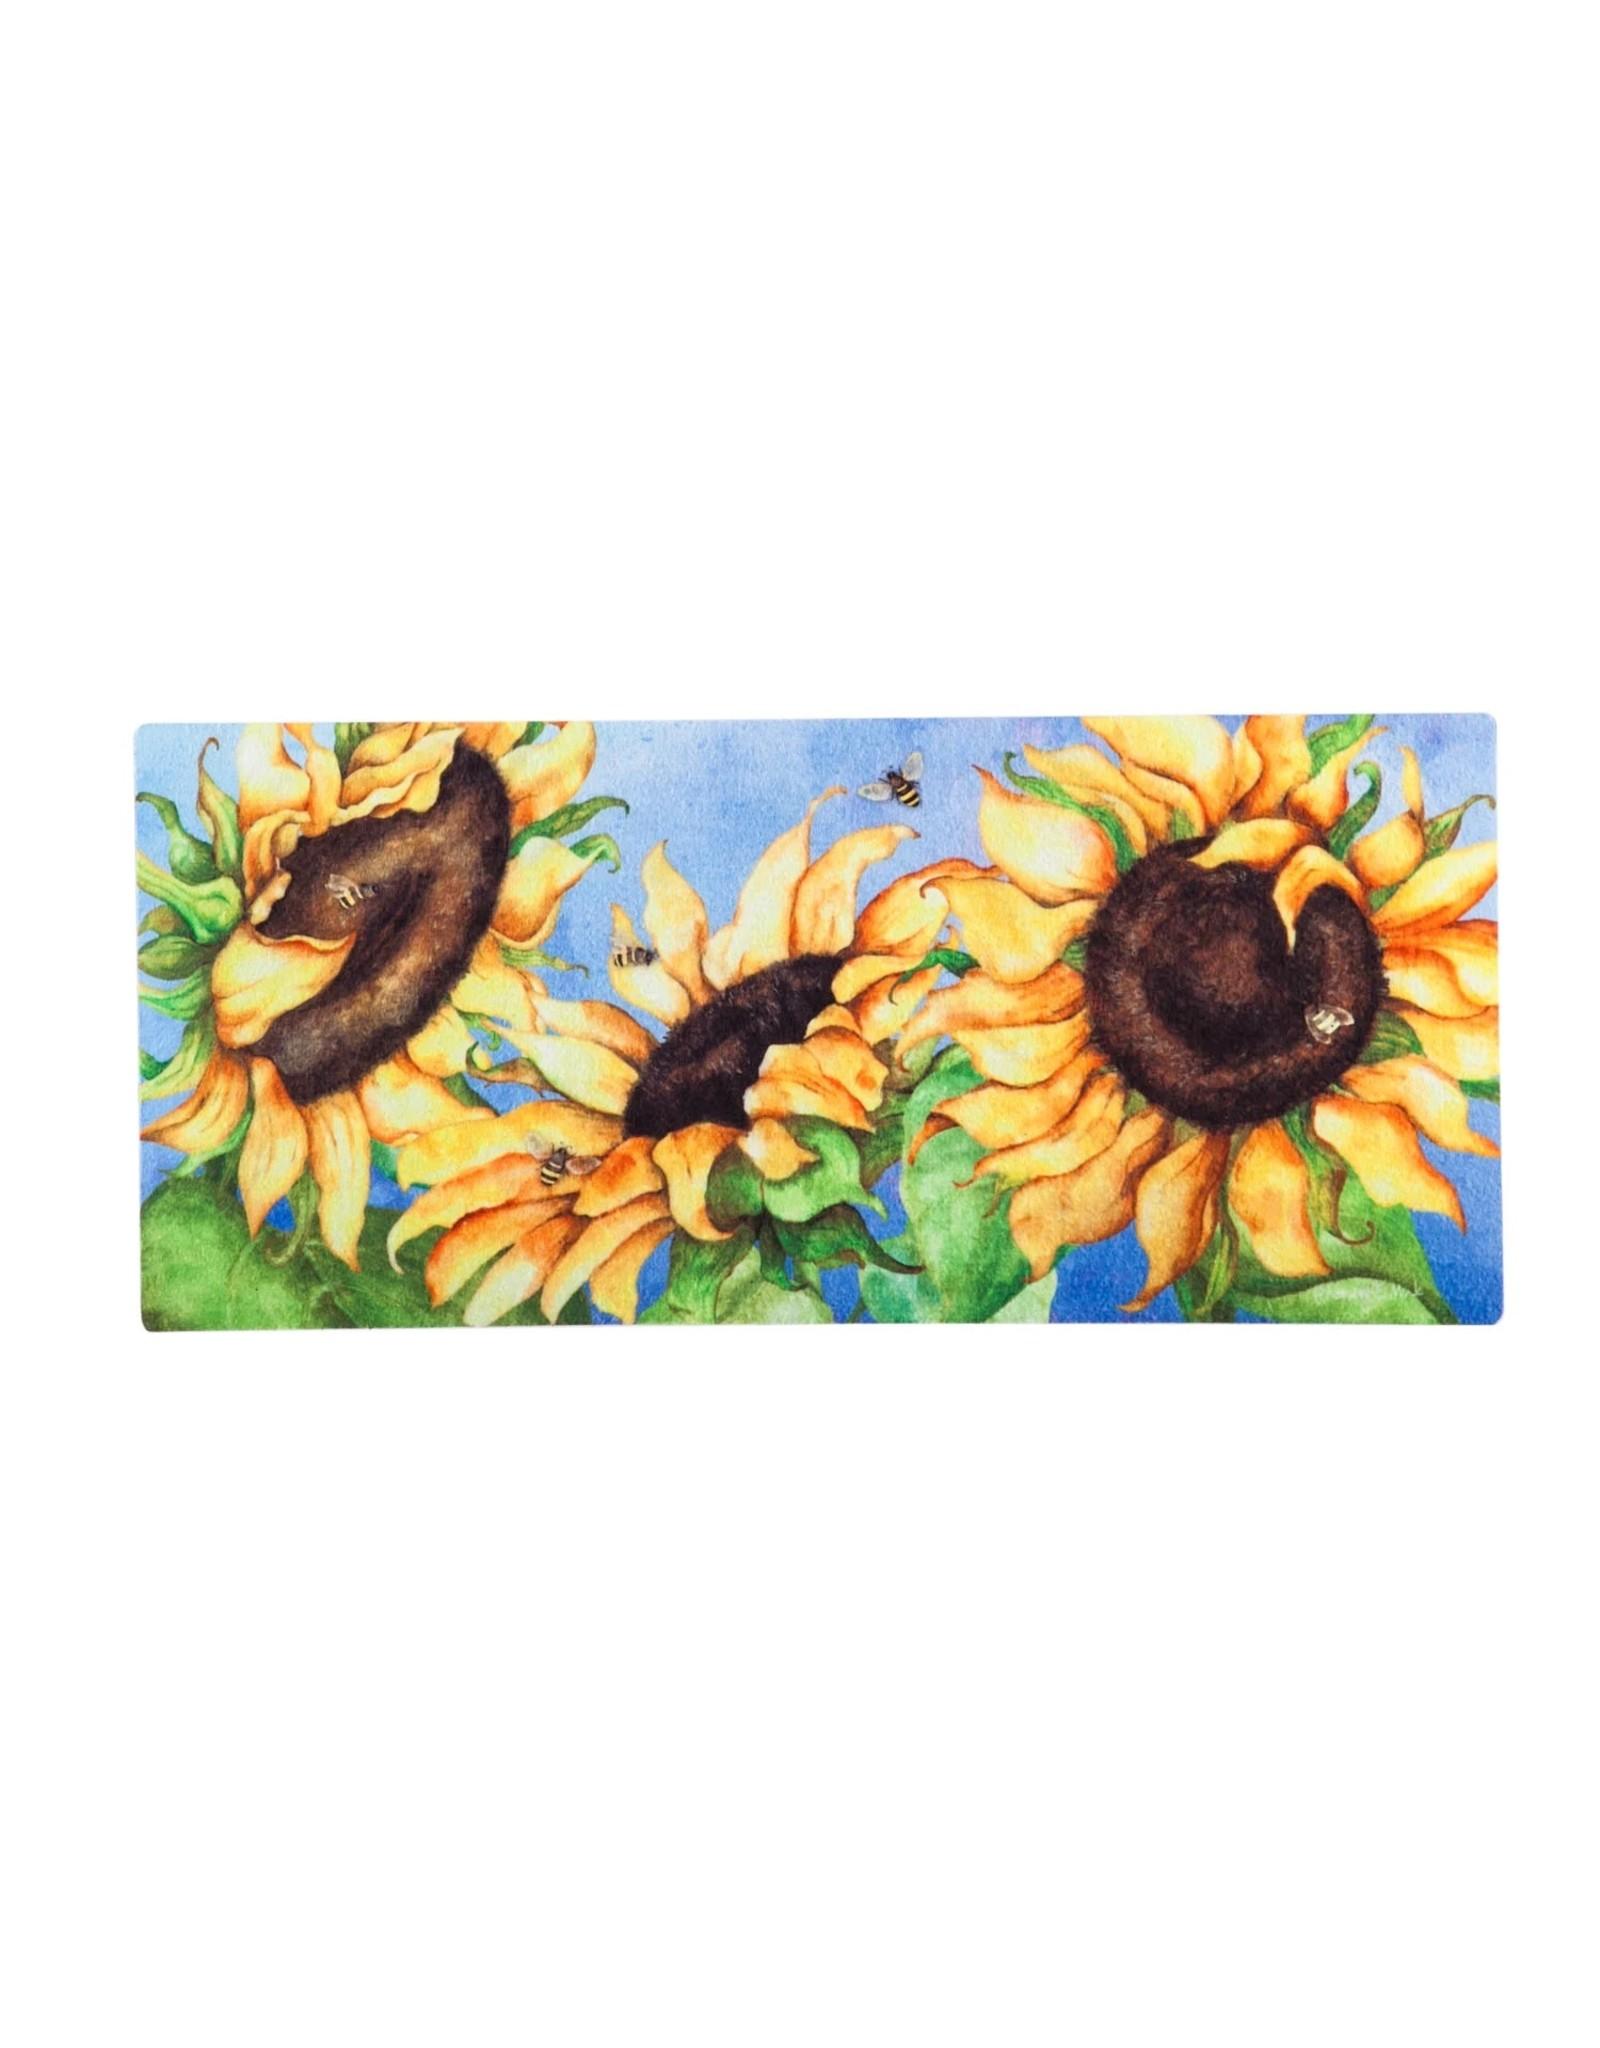 Evergreen Enterprises Hello Honey Sunflowers Sassafras Switch Mat